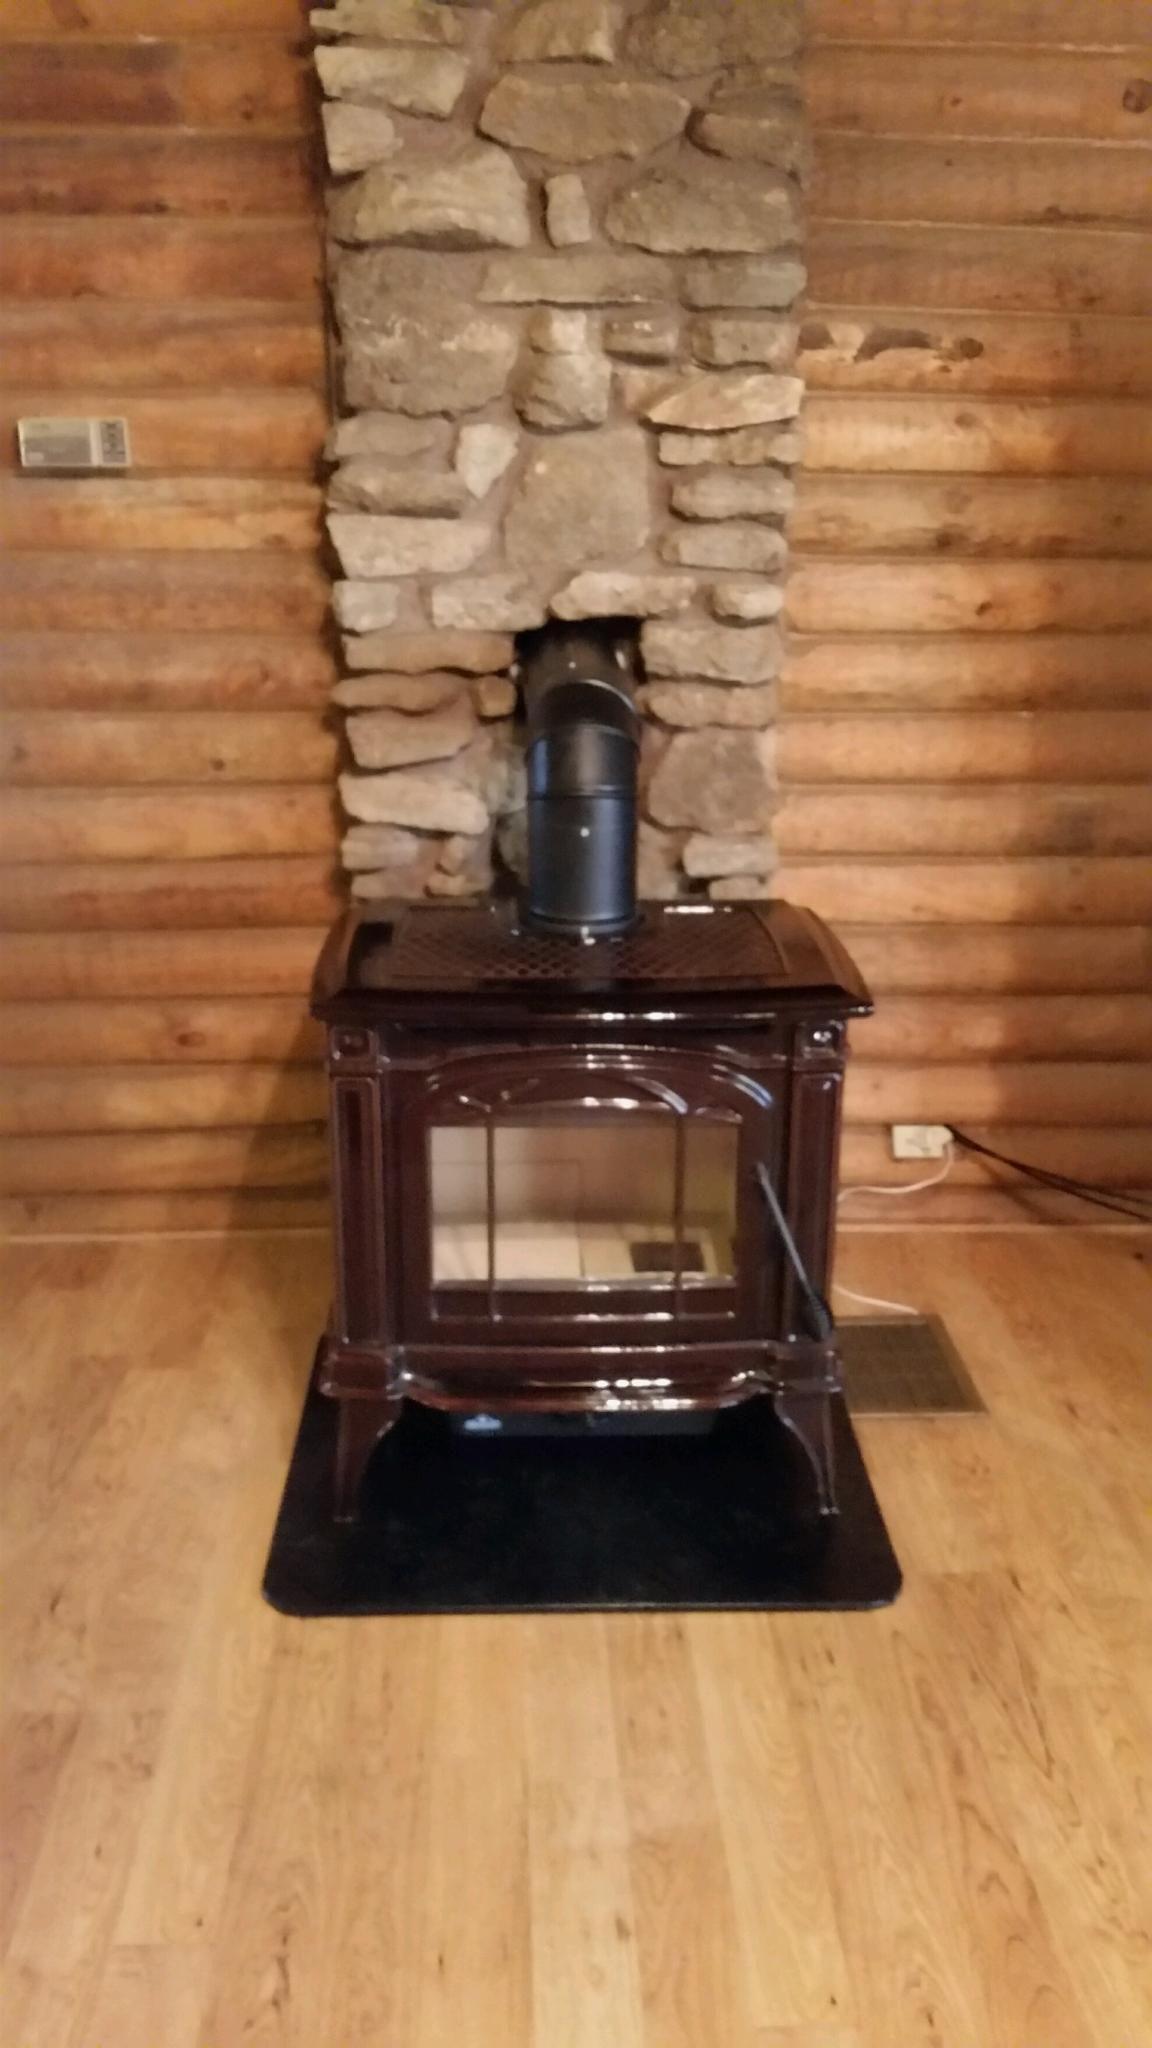 Wood Stoves & Stove Inserts by Nashville Fireplace  & Chimney. www.nashvillechimneysweep.net #nashvillechimney #fireplaces #NashvilleTN #cleanthechimney